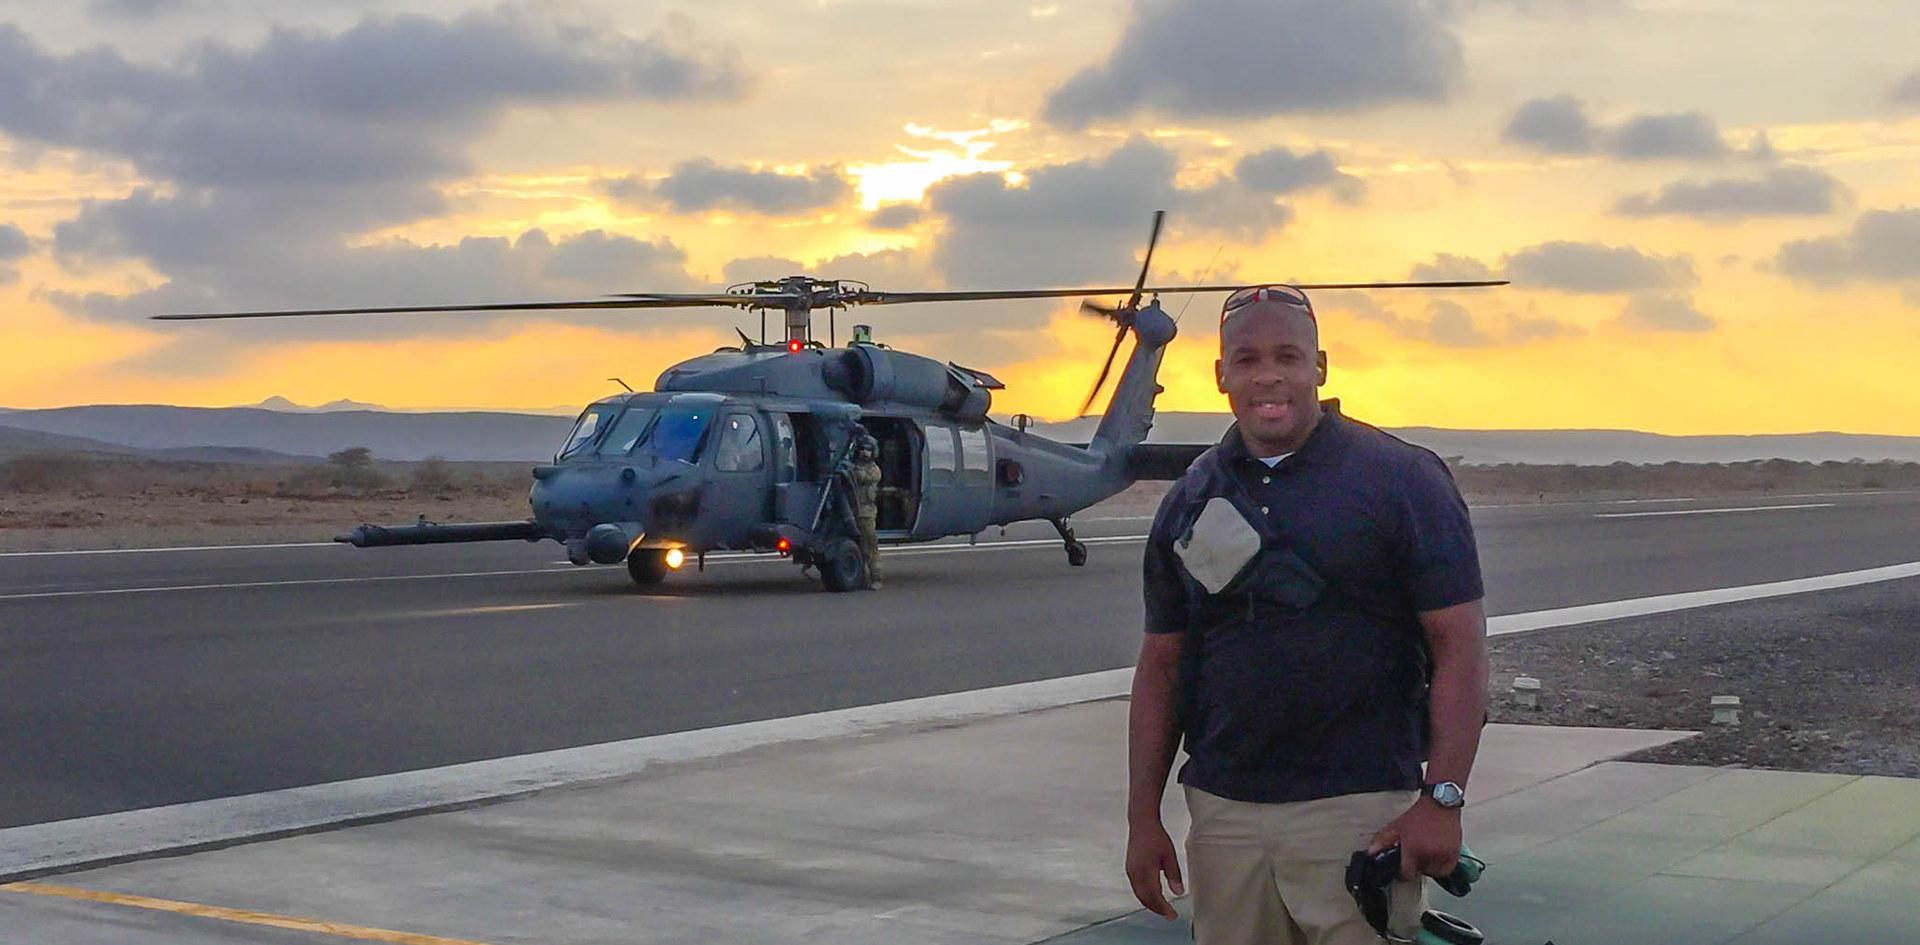 Recon Flight, Djibouti, Africa